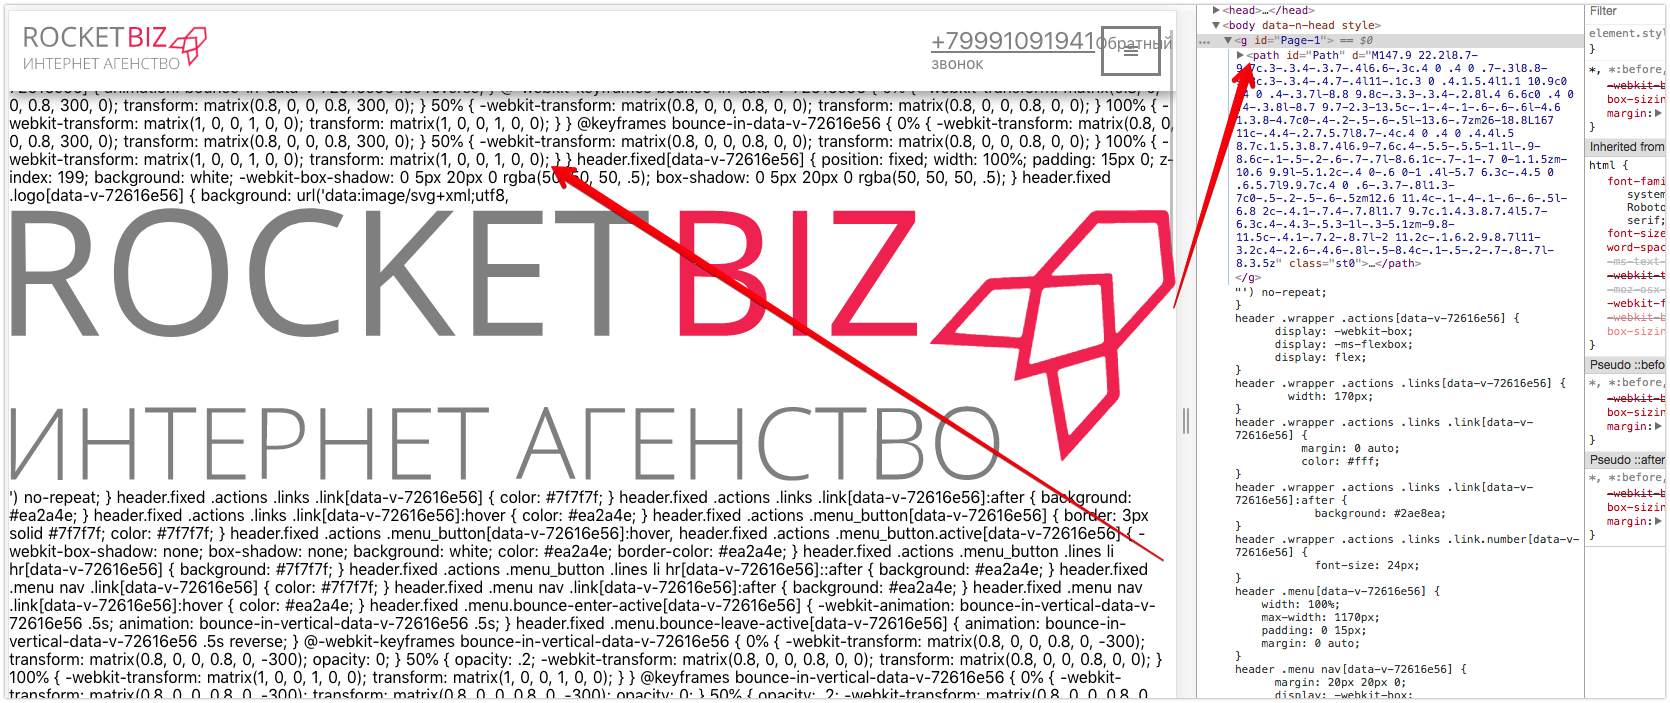 rocketbizsite 2018-05-07 17-00-44.png